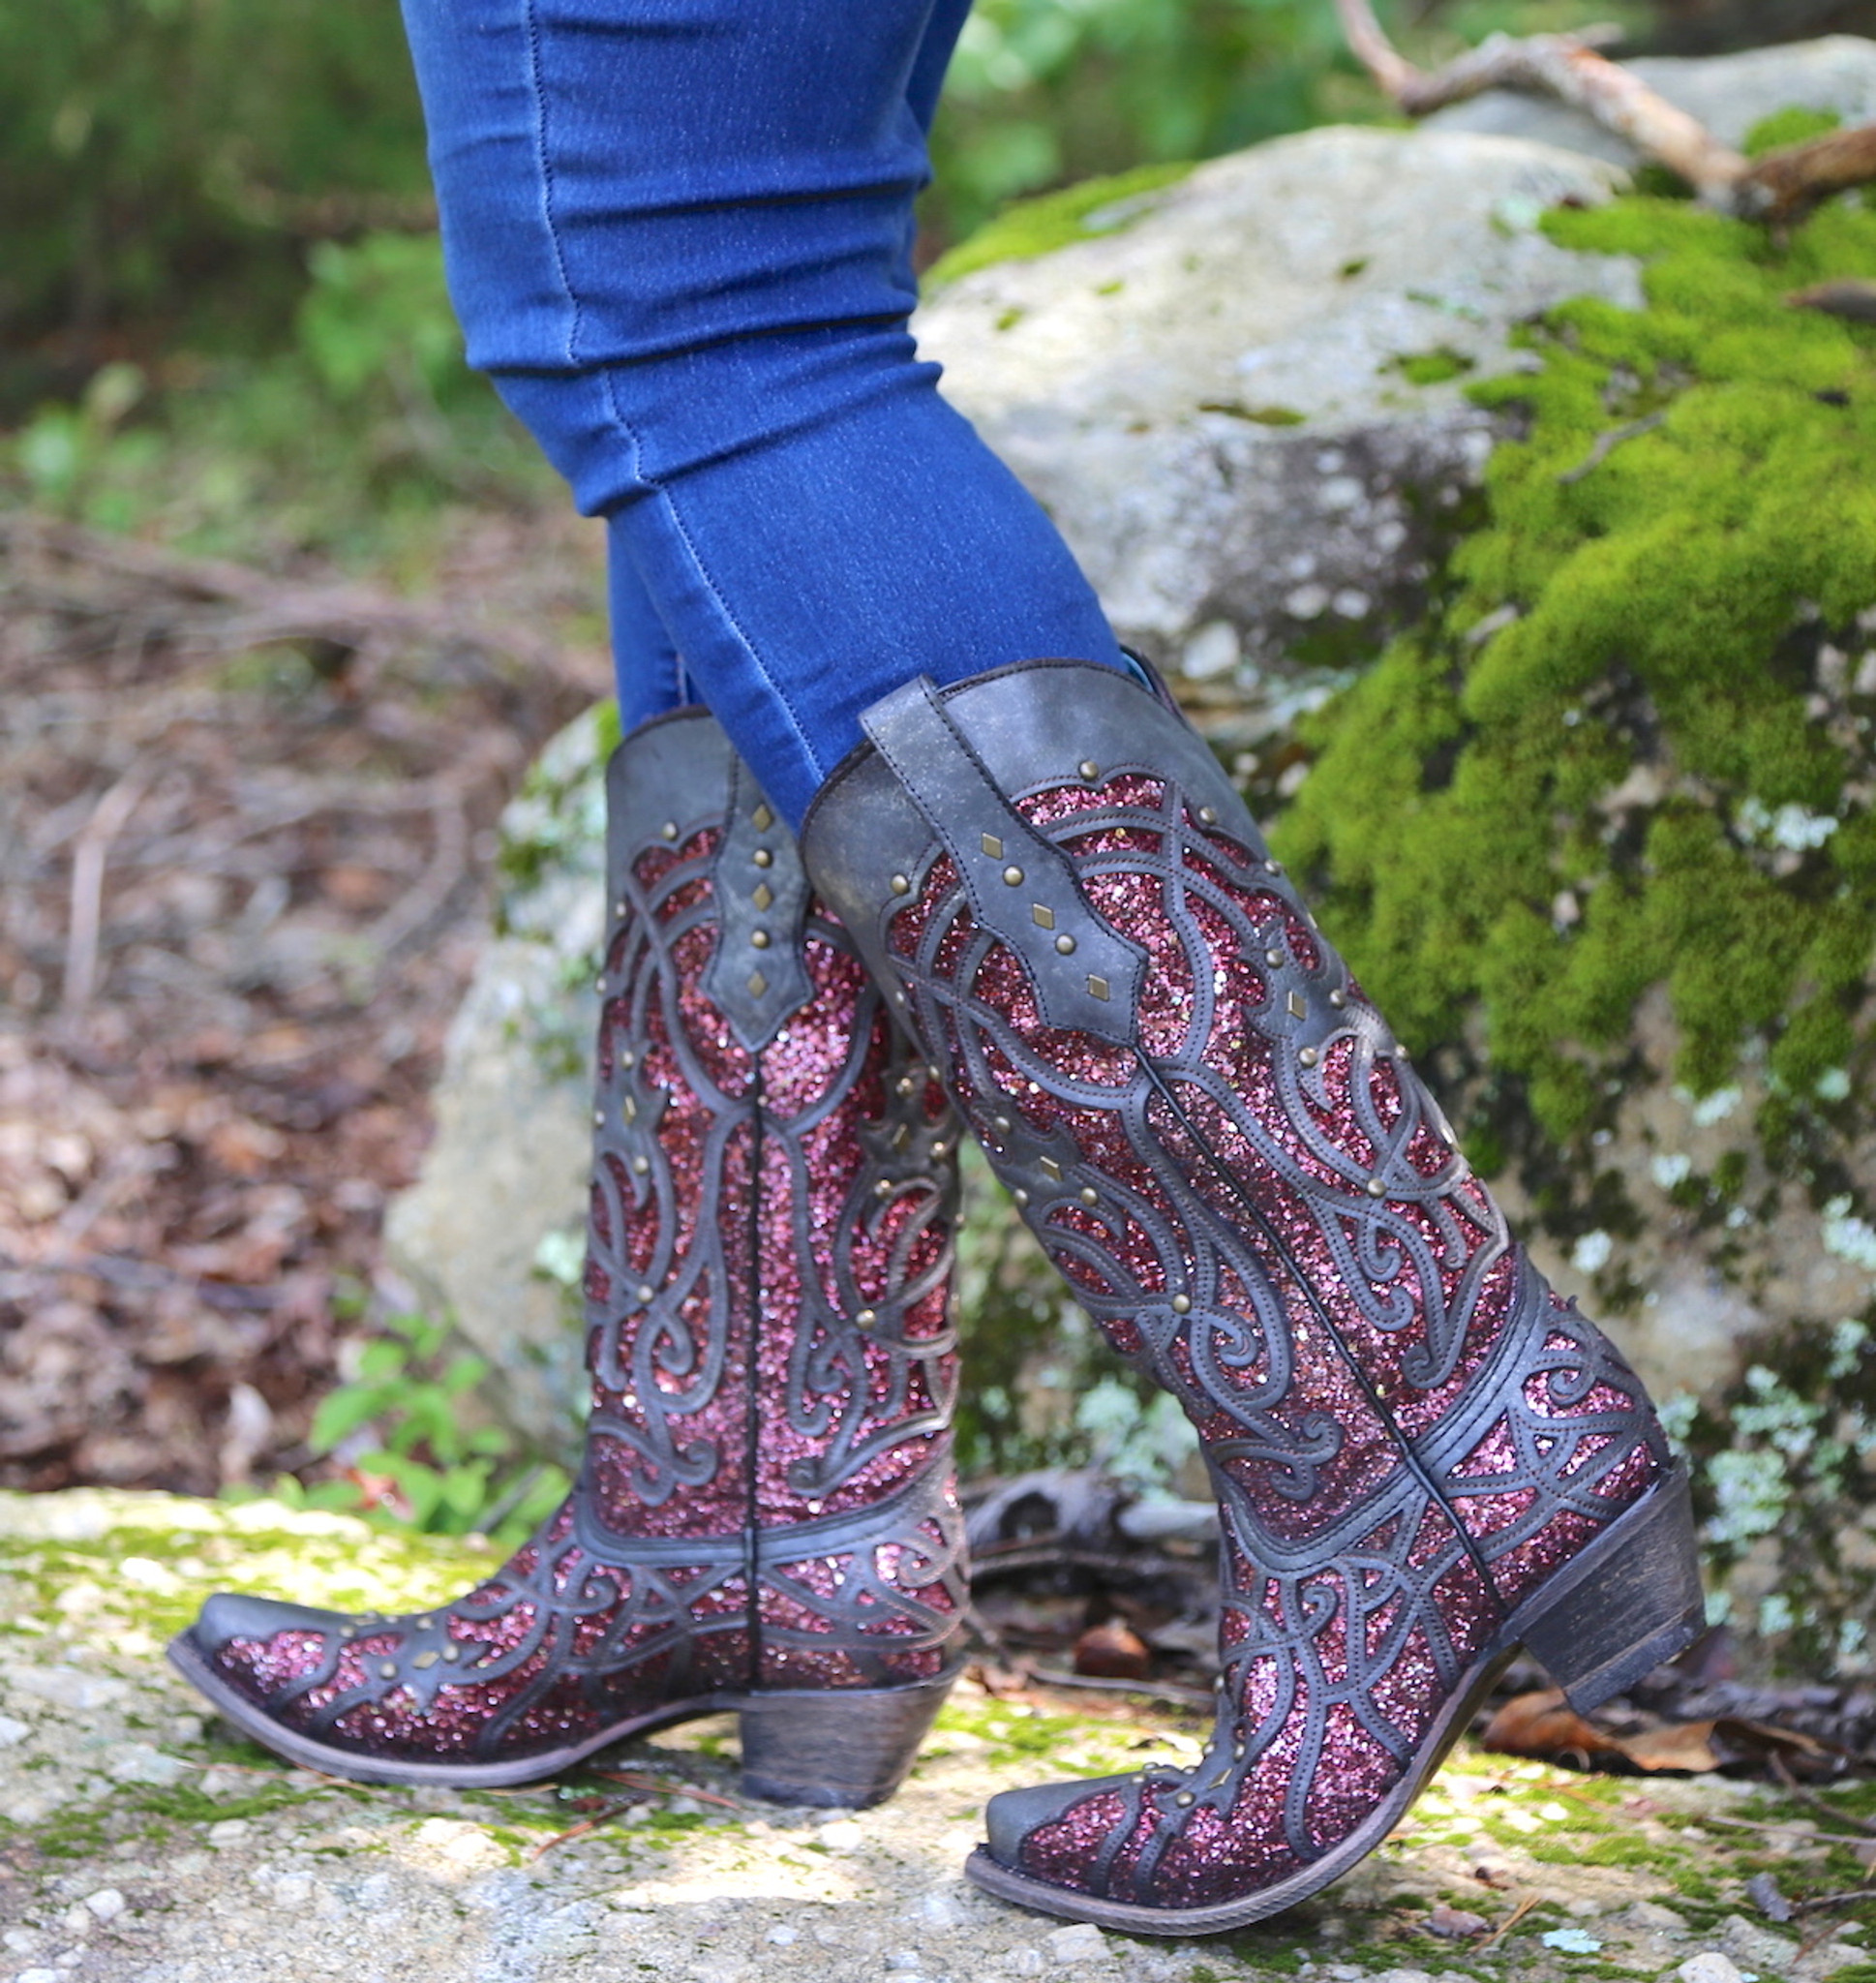 15557e3c681d Corral Black Plum Glitter Inlay and Studs Snip Toe Boots C3406 Walk